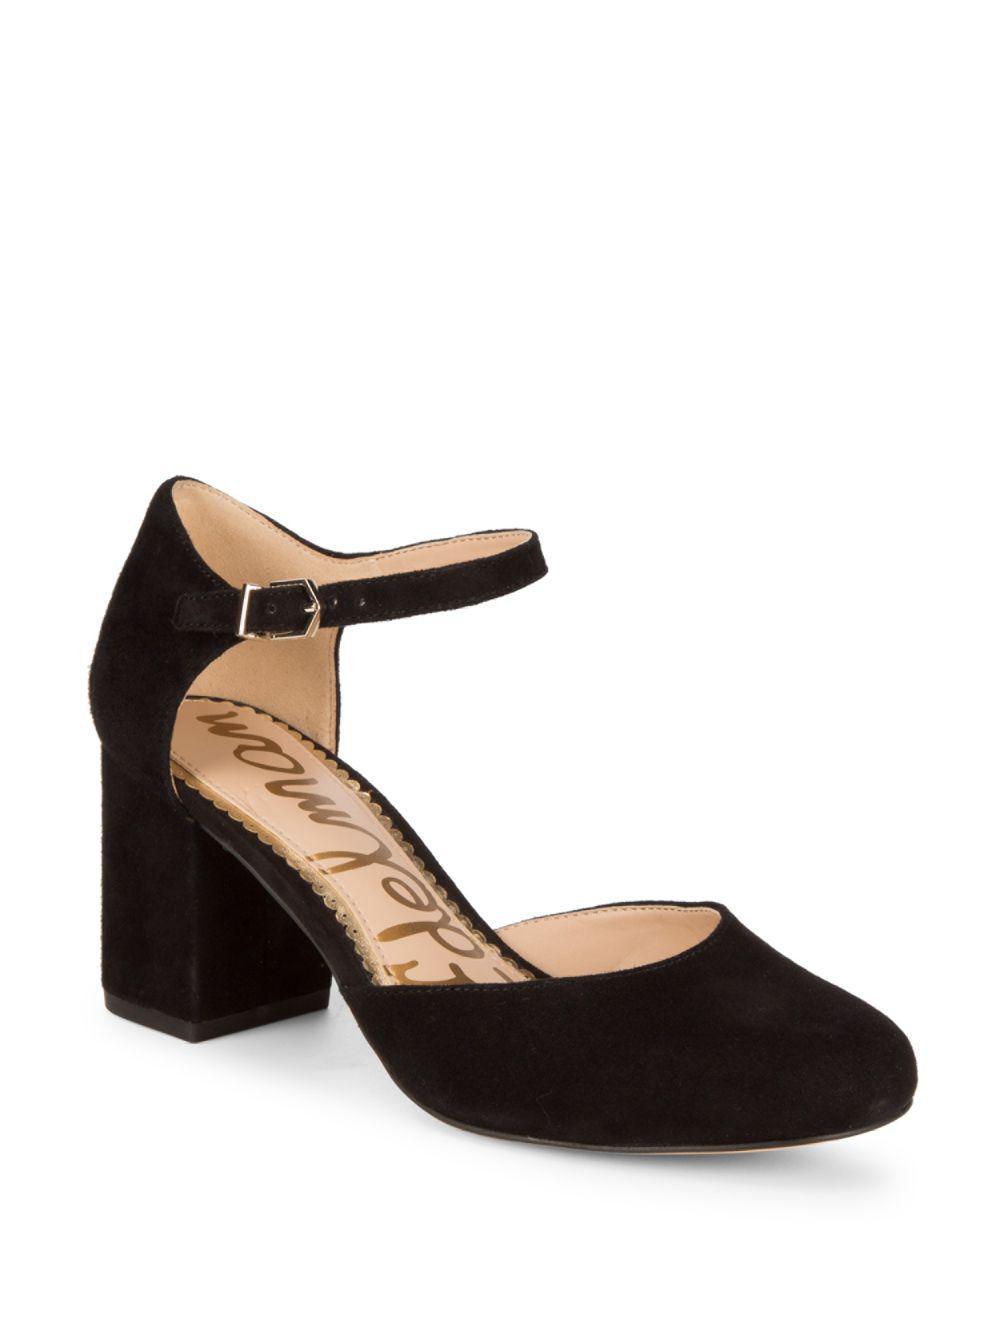 8a8b11f1e Lyst - Sam Edelman Clover Ankle-strap Pumps in Black